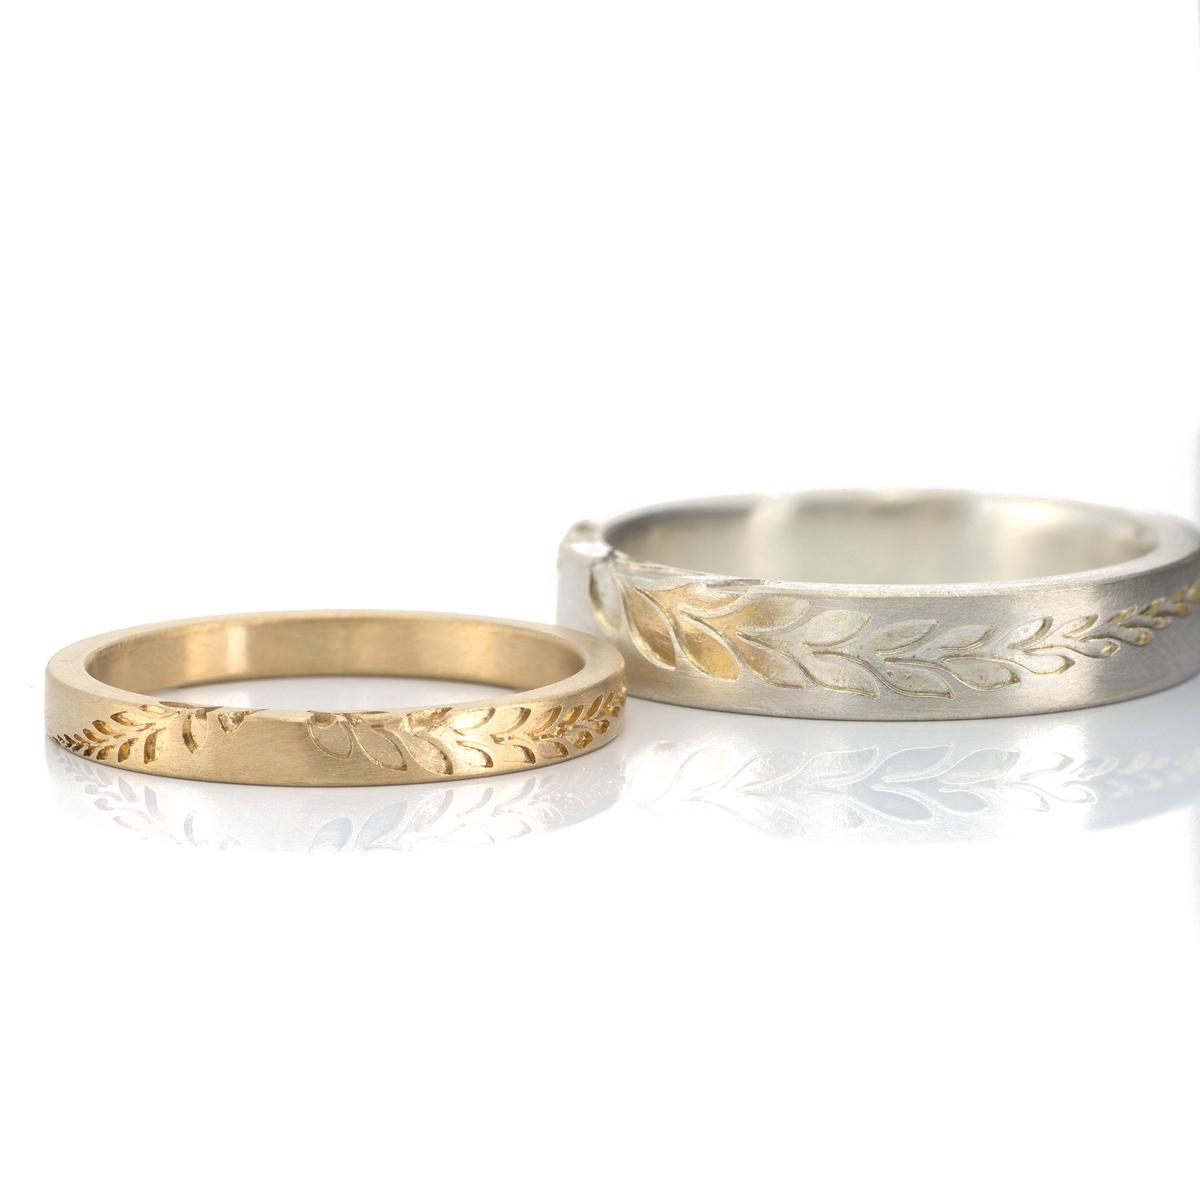 fern ring 2.0mm and 4.0mm square  #シダの指輪 #屋久島でつくる結婚指輪